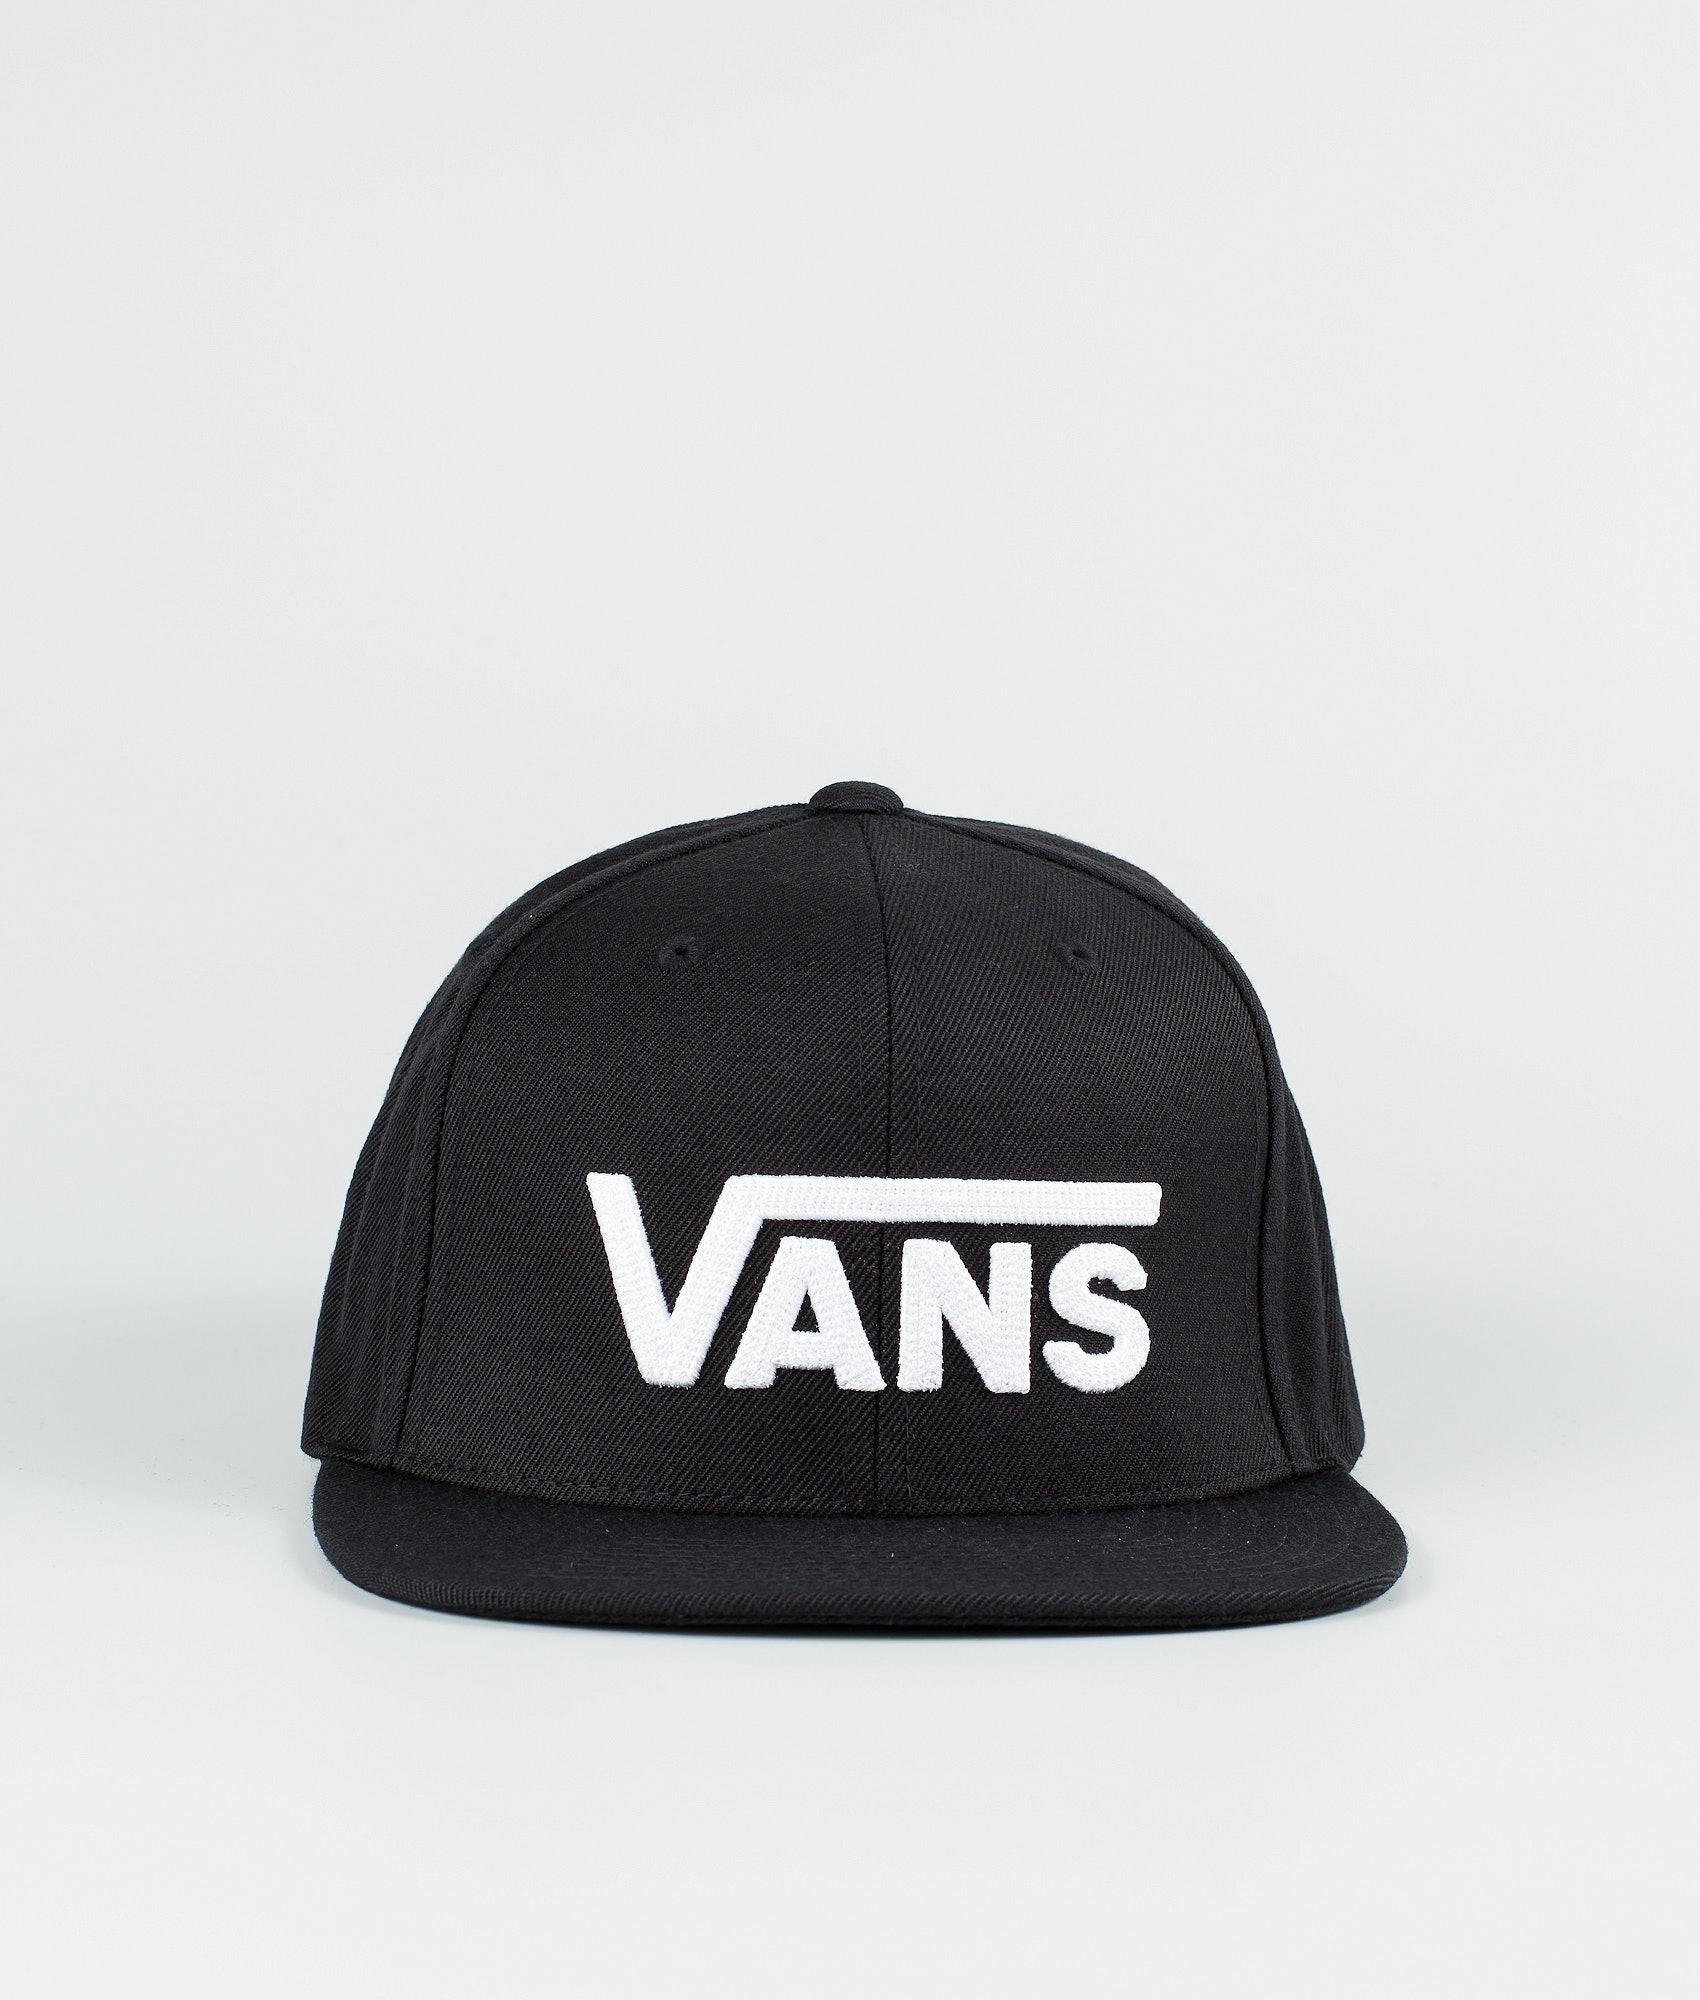 Vans Drop V II Snapback Cap Black White - Ridestore.de 280ae9ce49